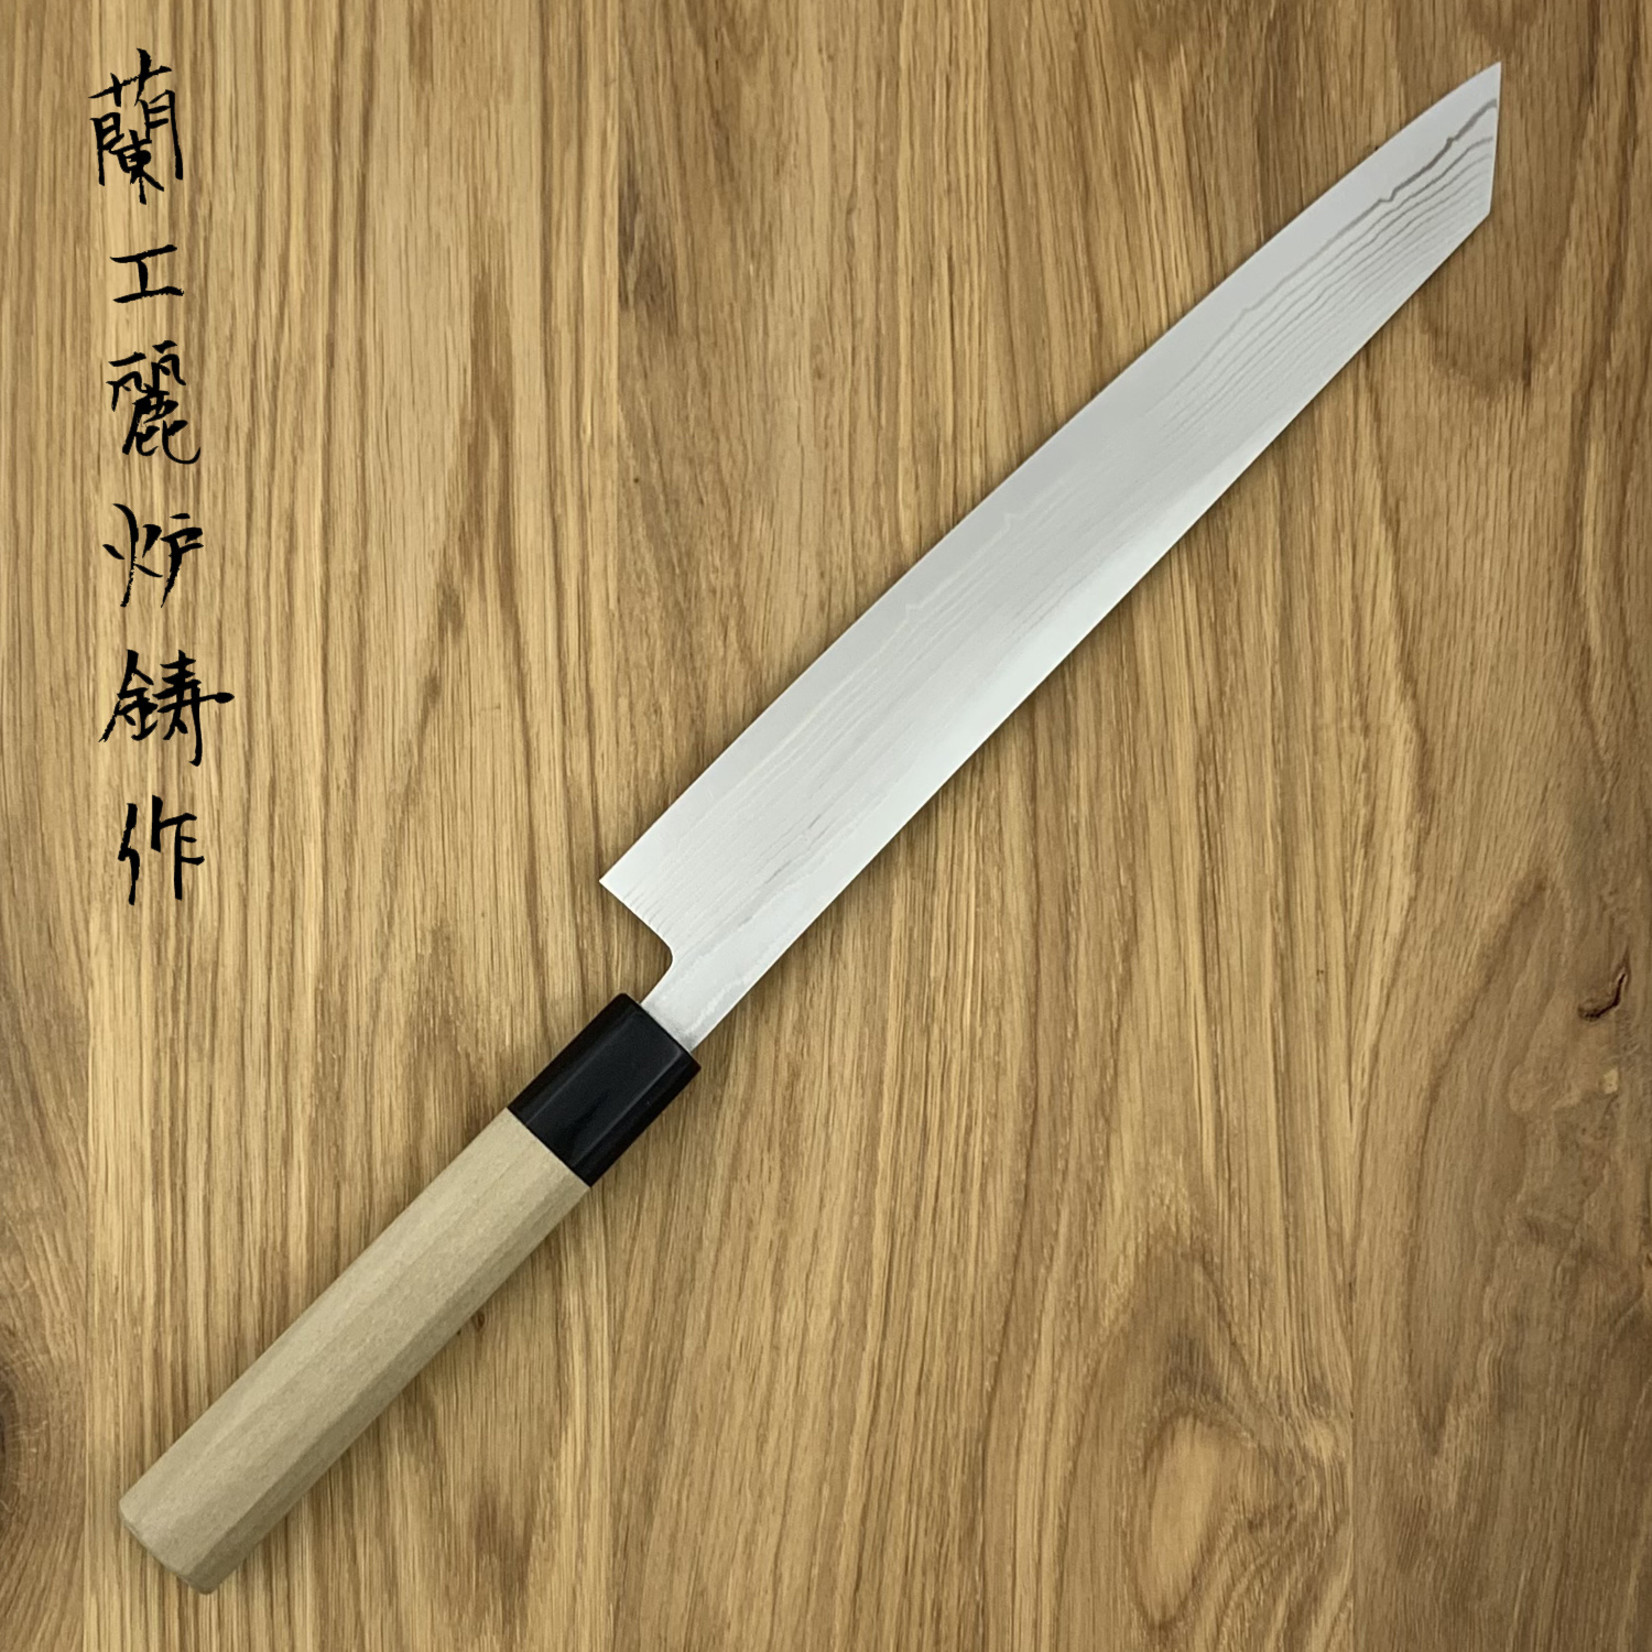 KANECHIKA AUS10 WA Slicer 240mm SK-A1D-KS240